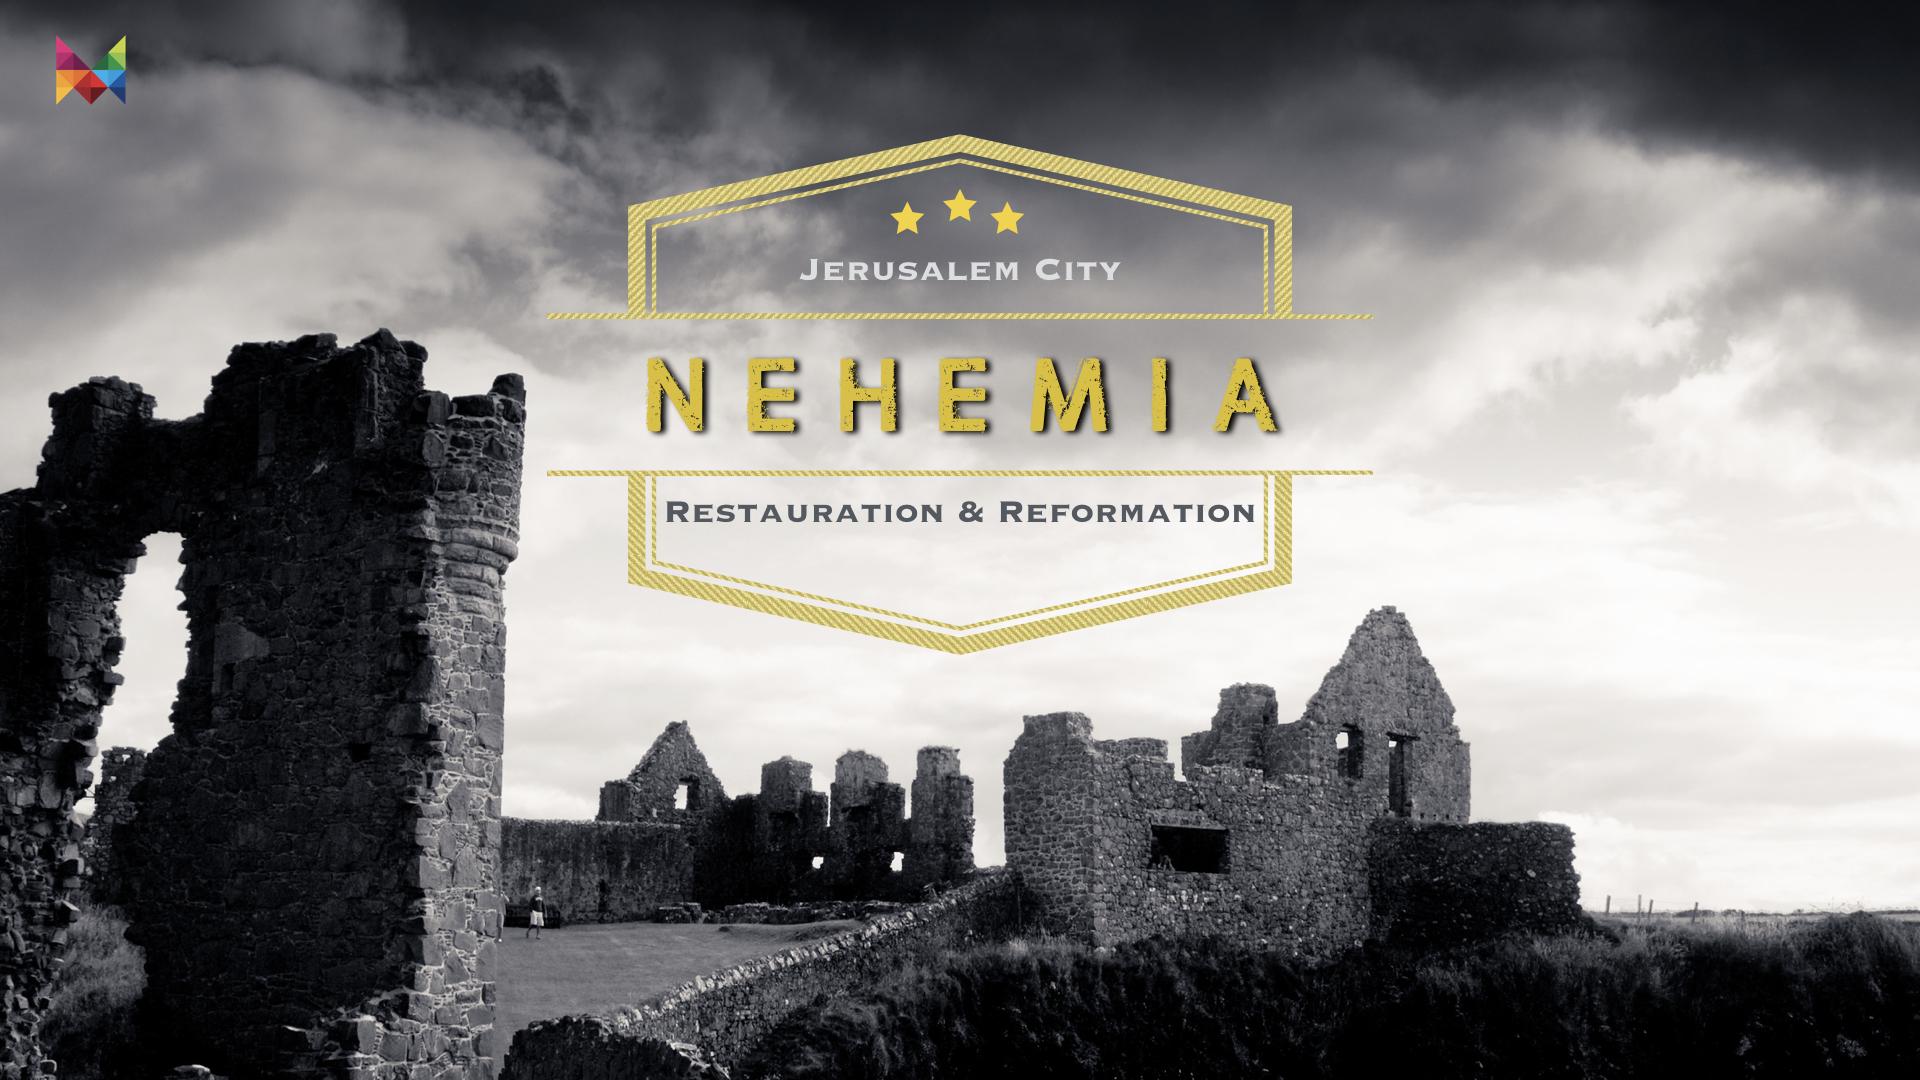 Nehemia. 08 Lebe in Aktion nicht Reaktion